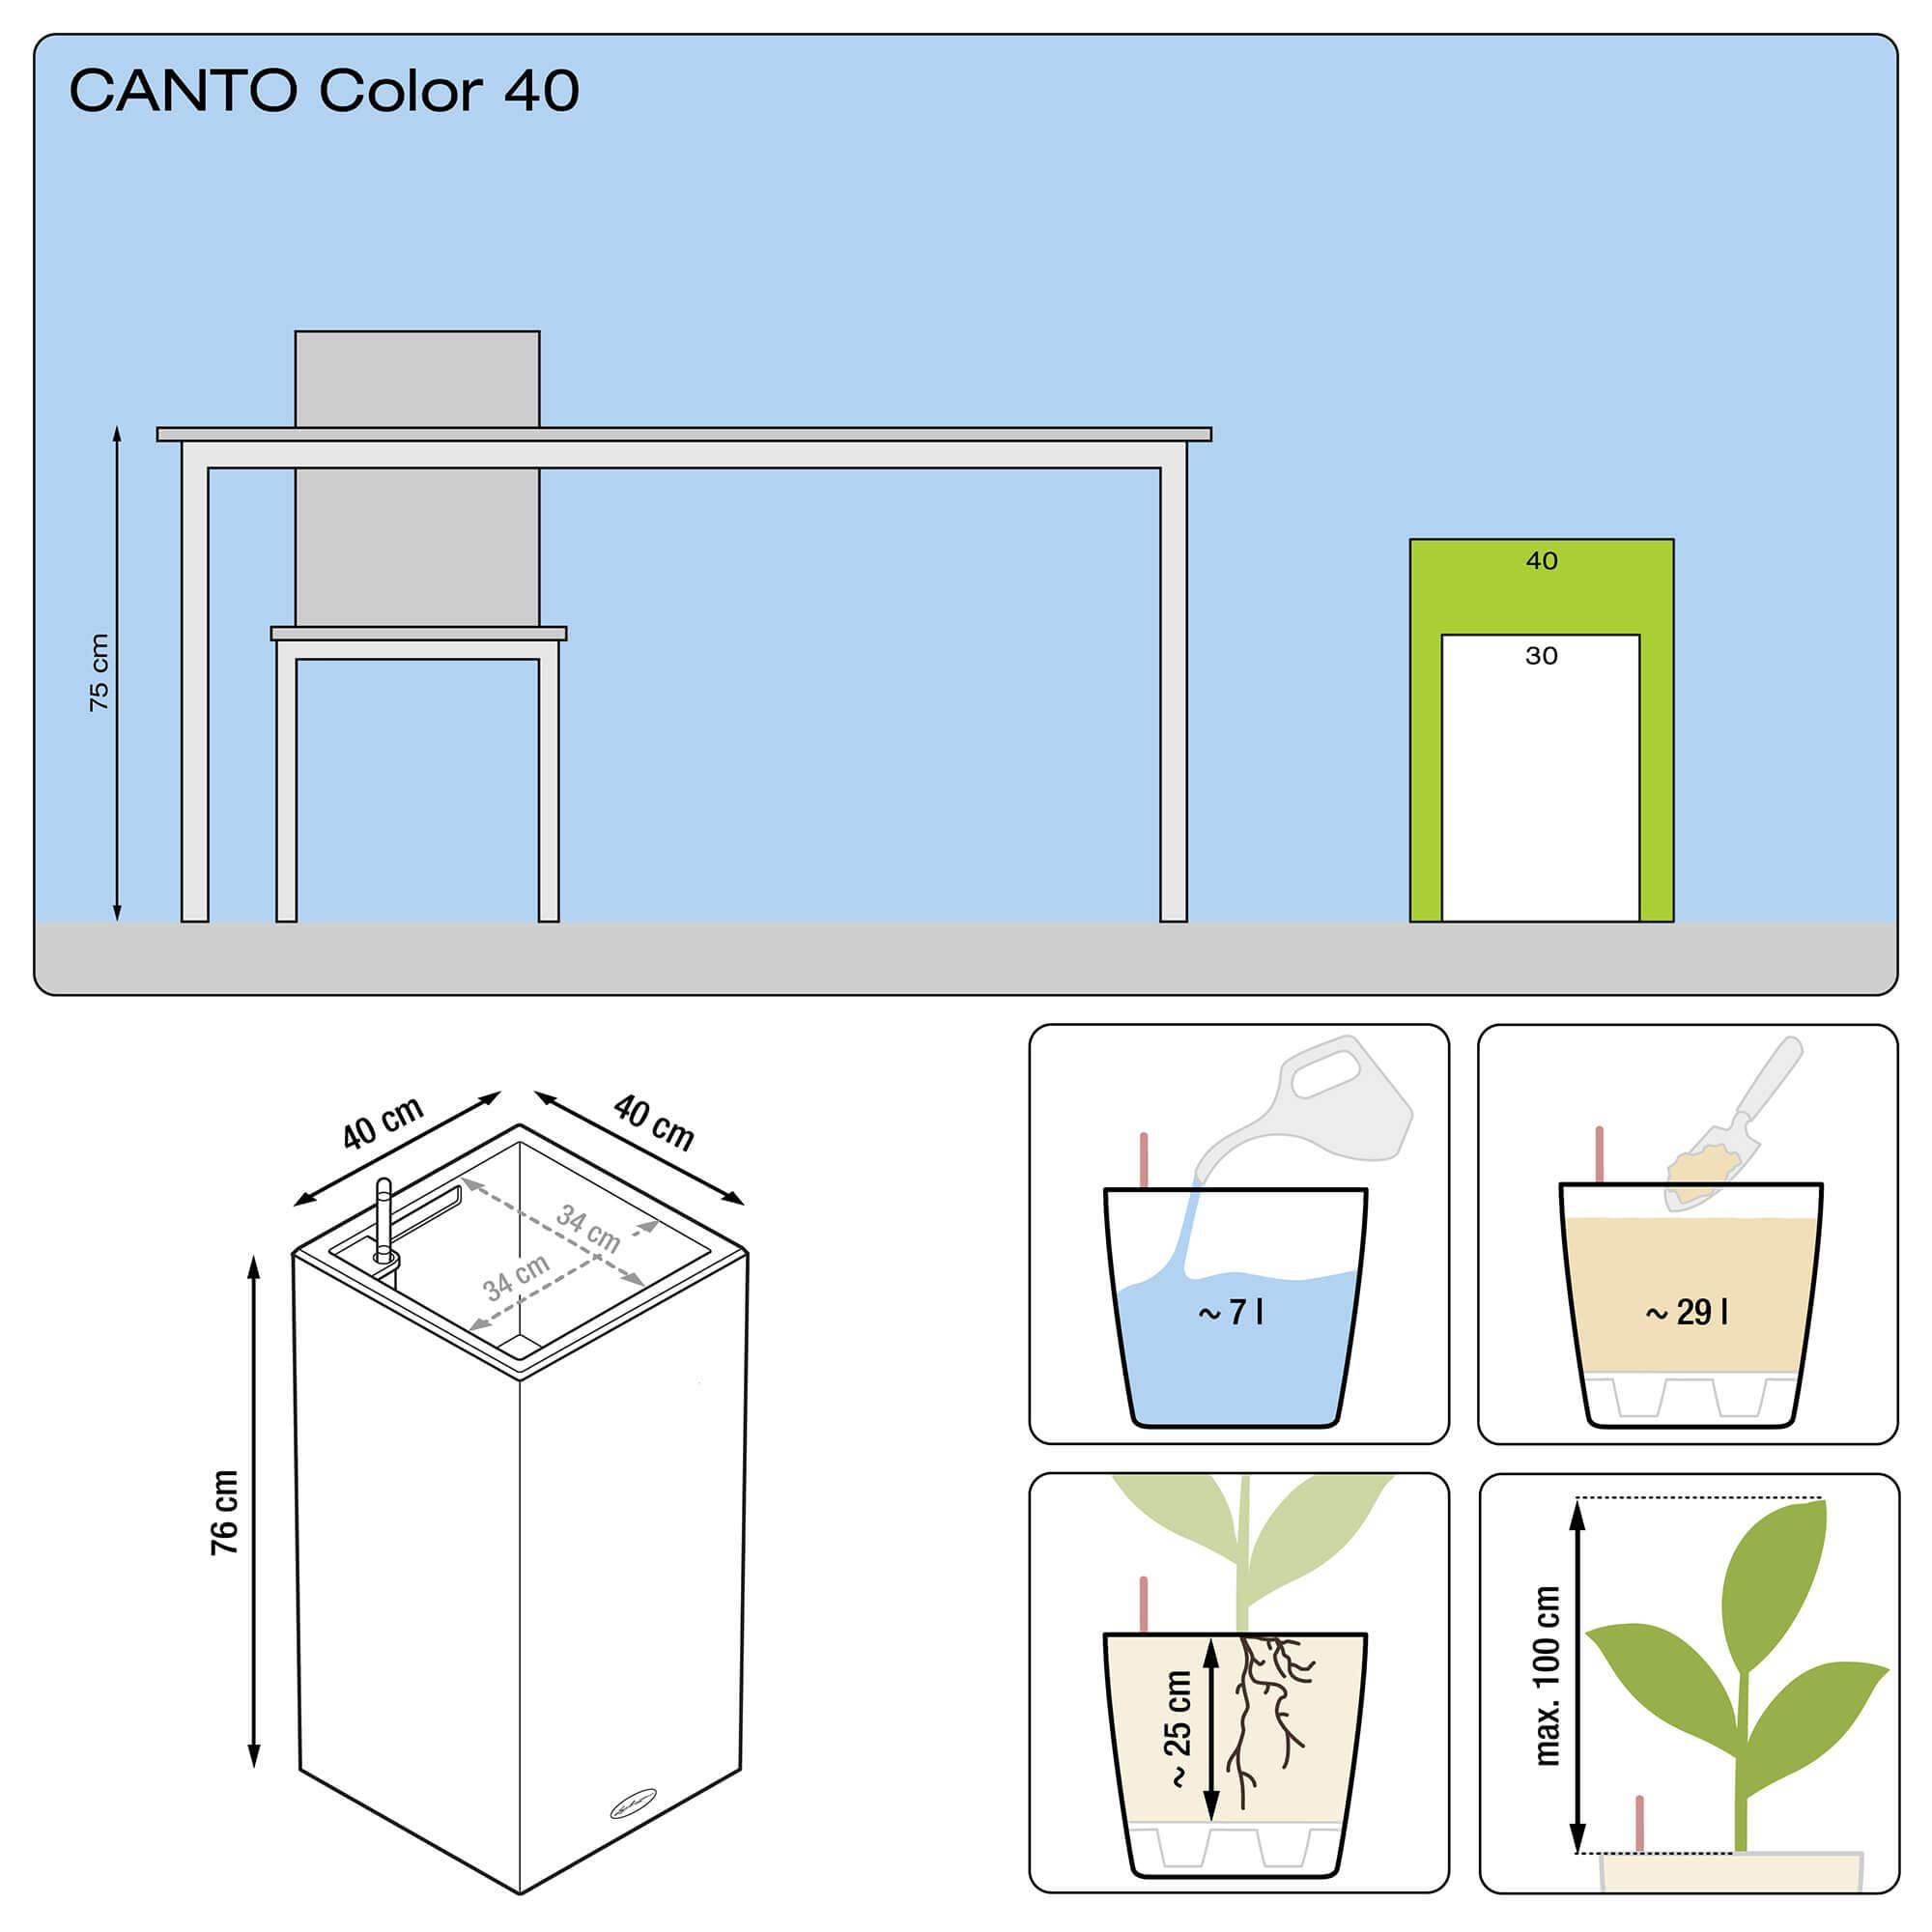 CANTO Color columna 40 beige arena - Imagen 3